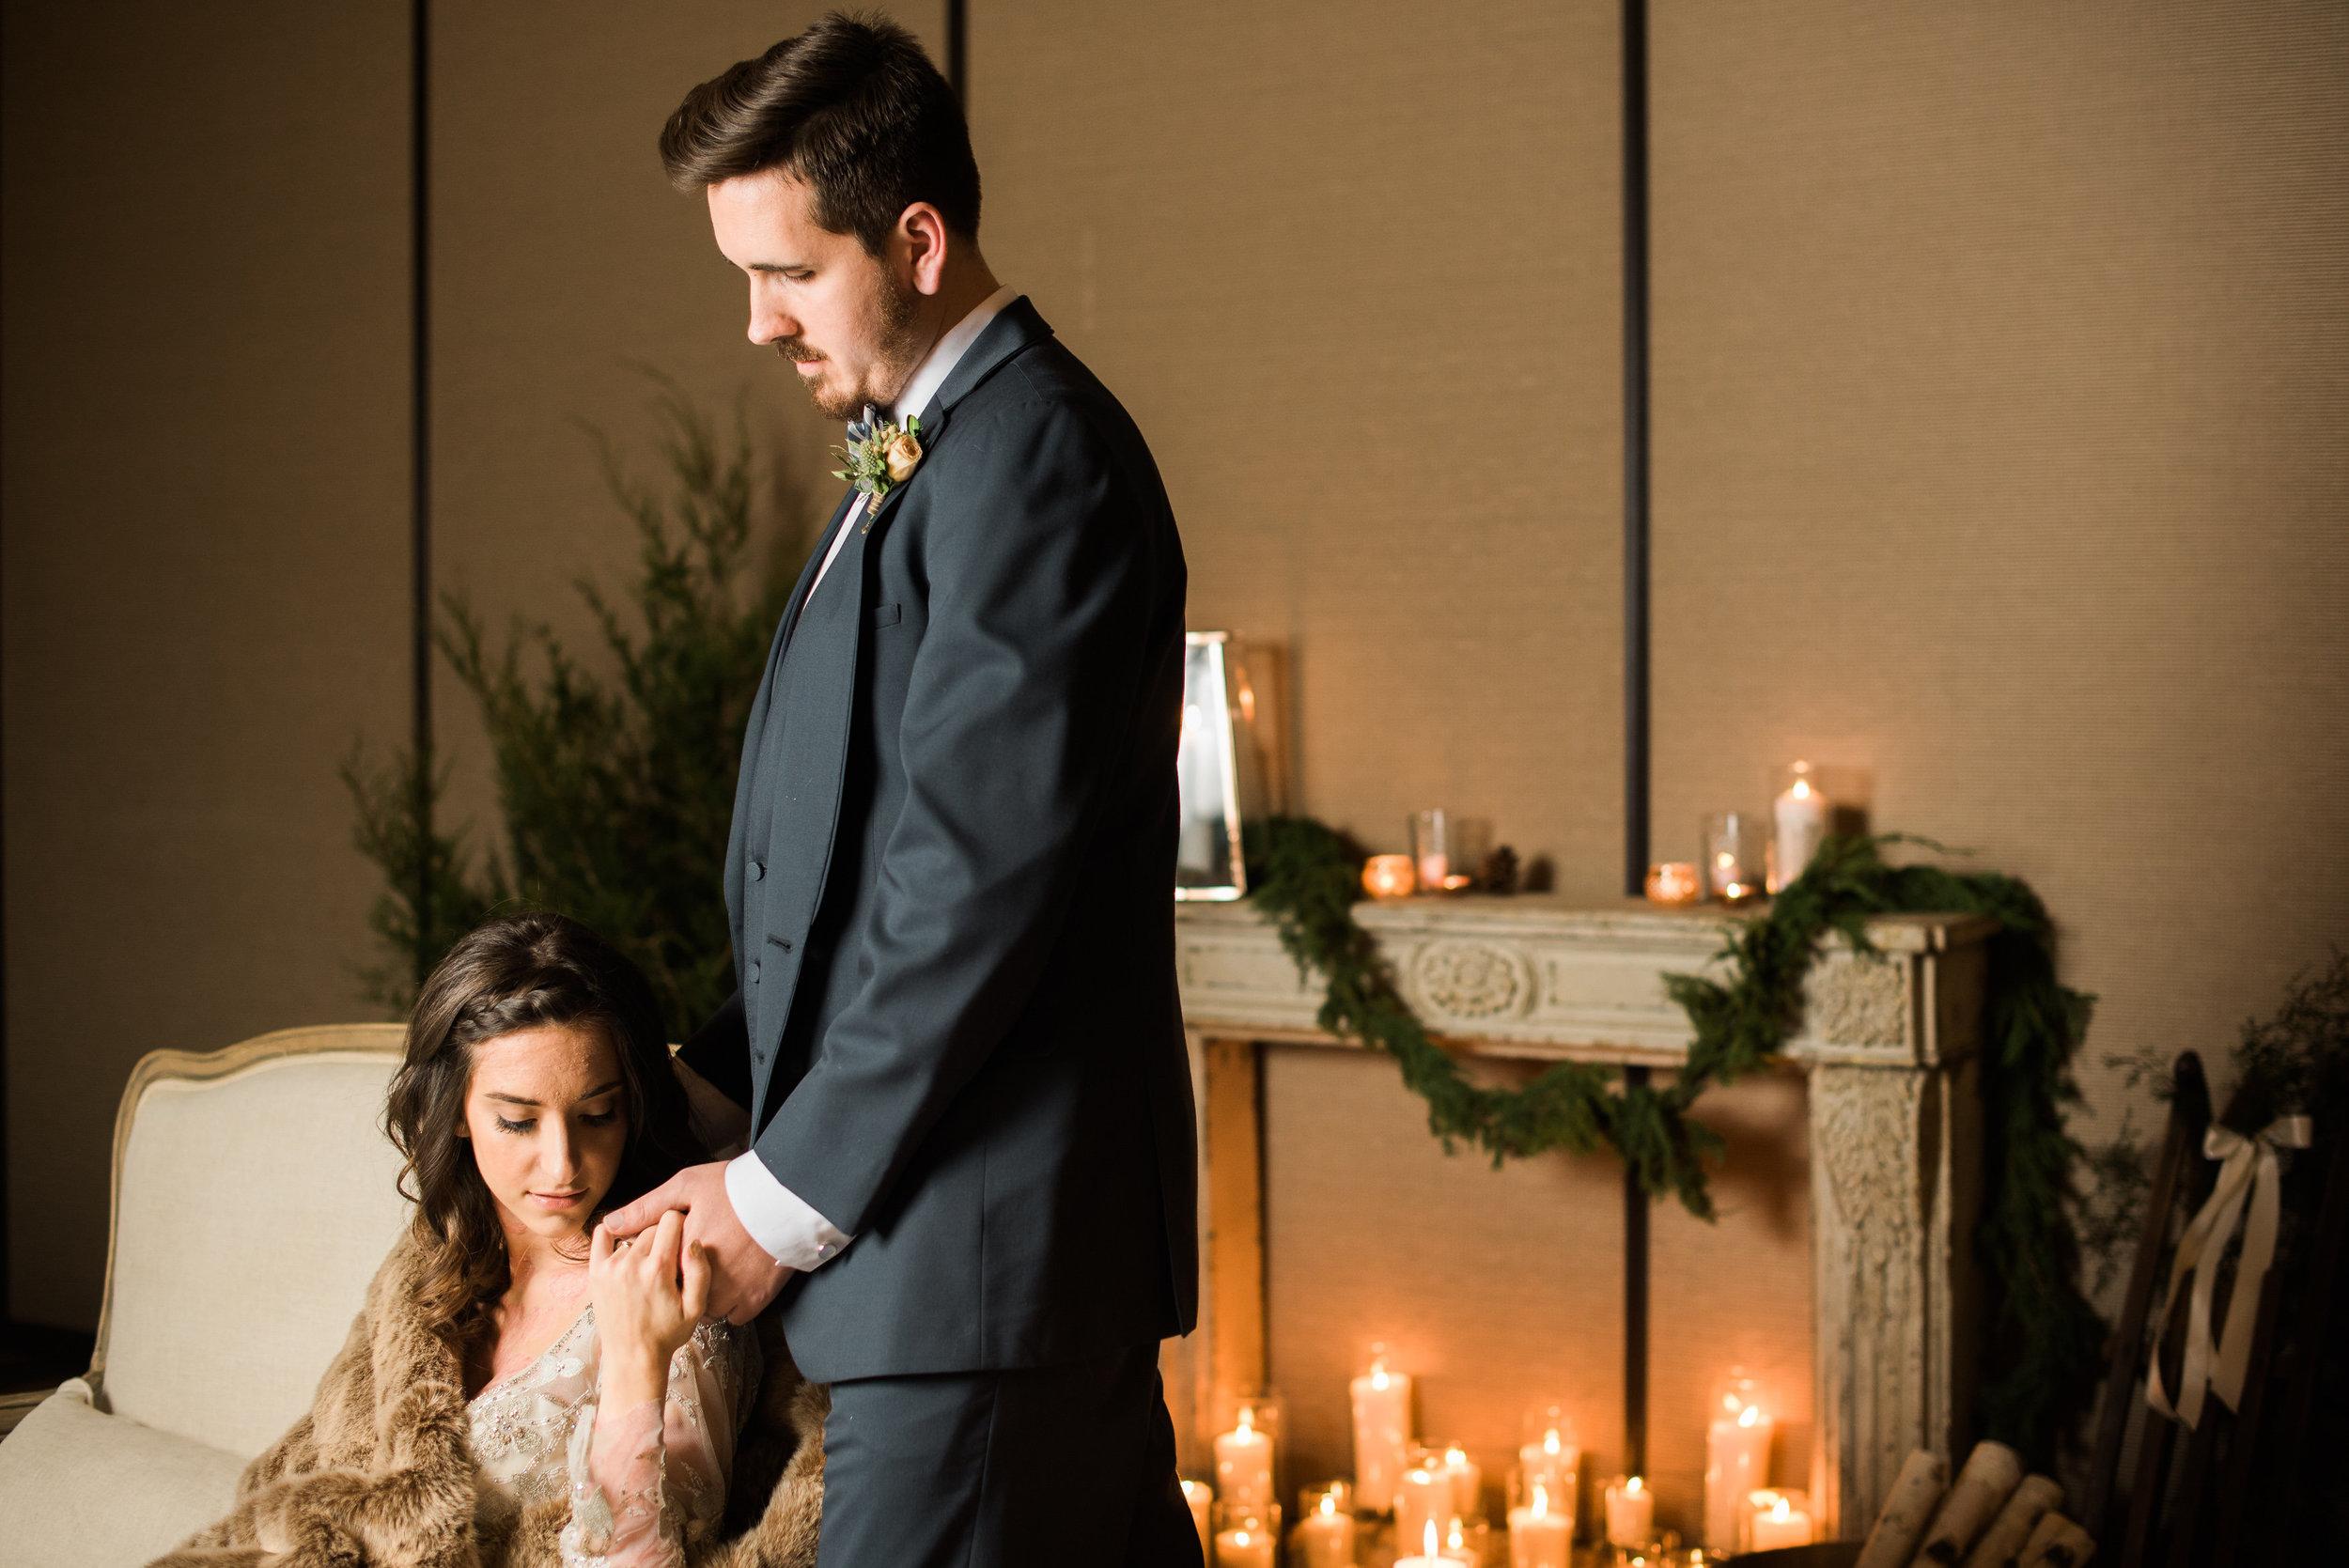 couple fireplace candlelight .jpg